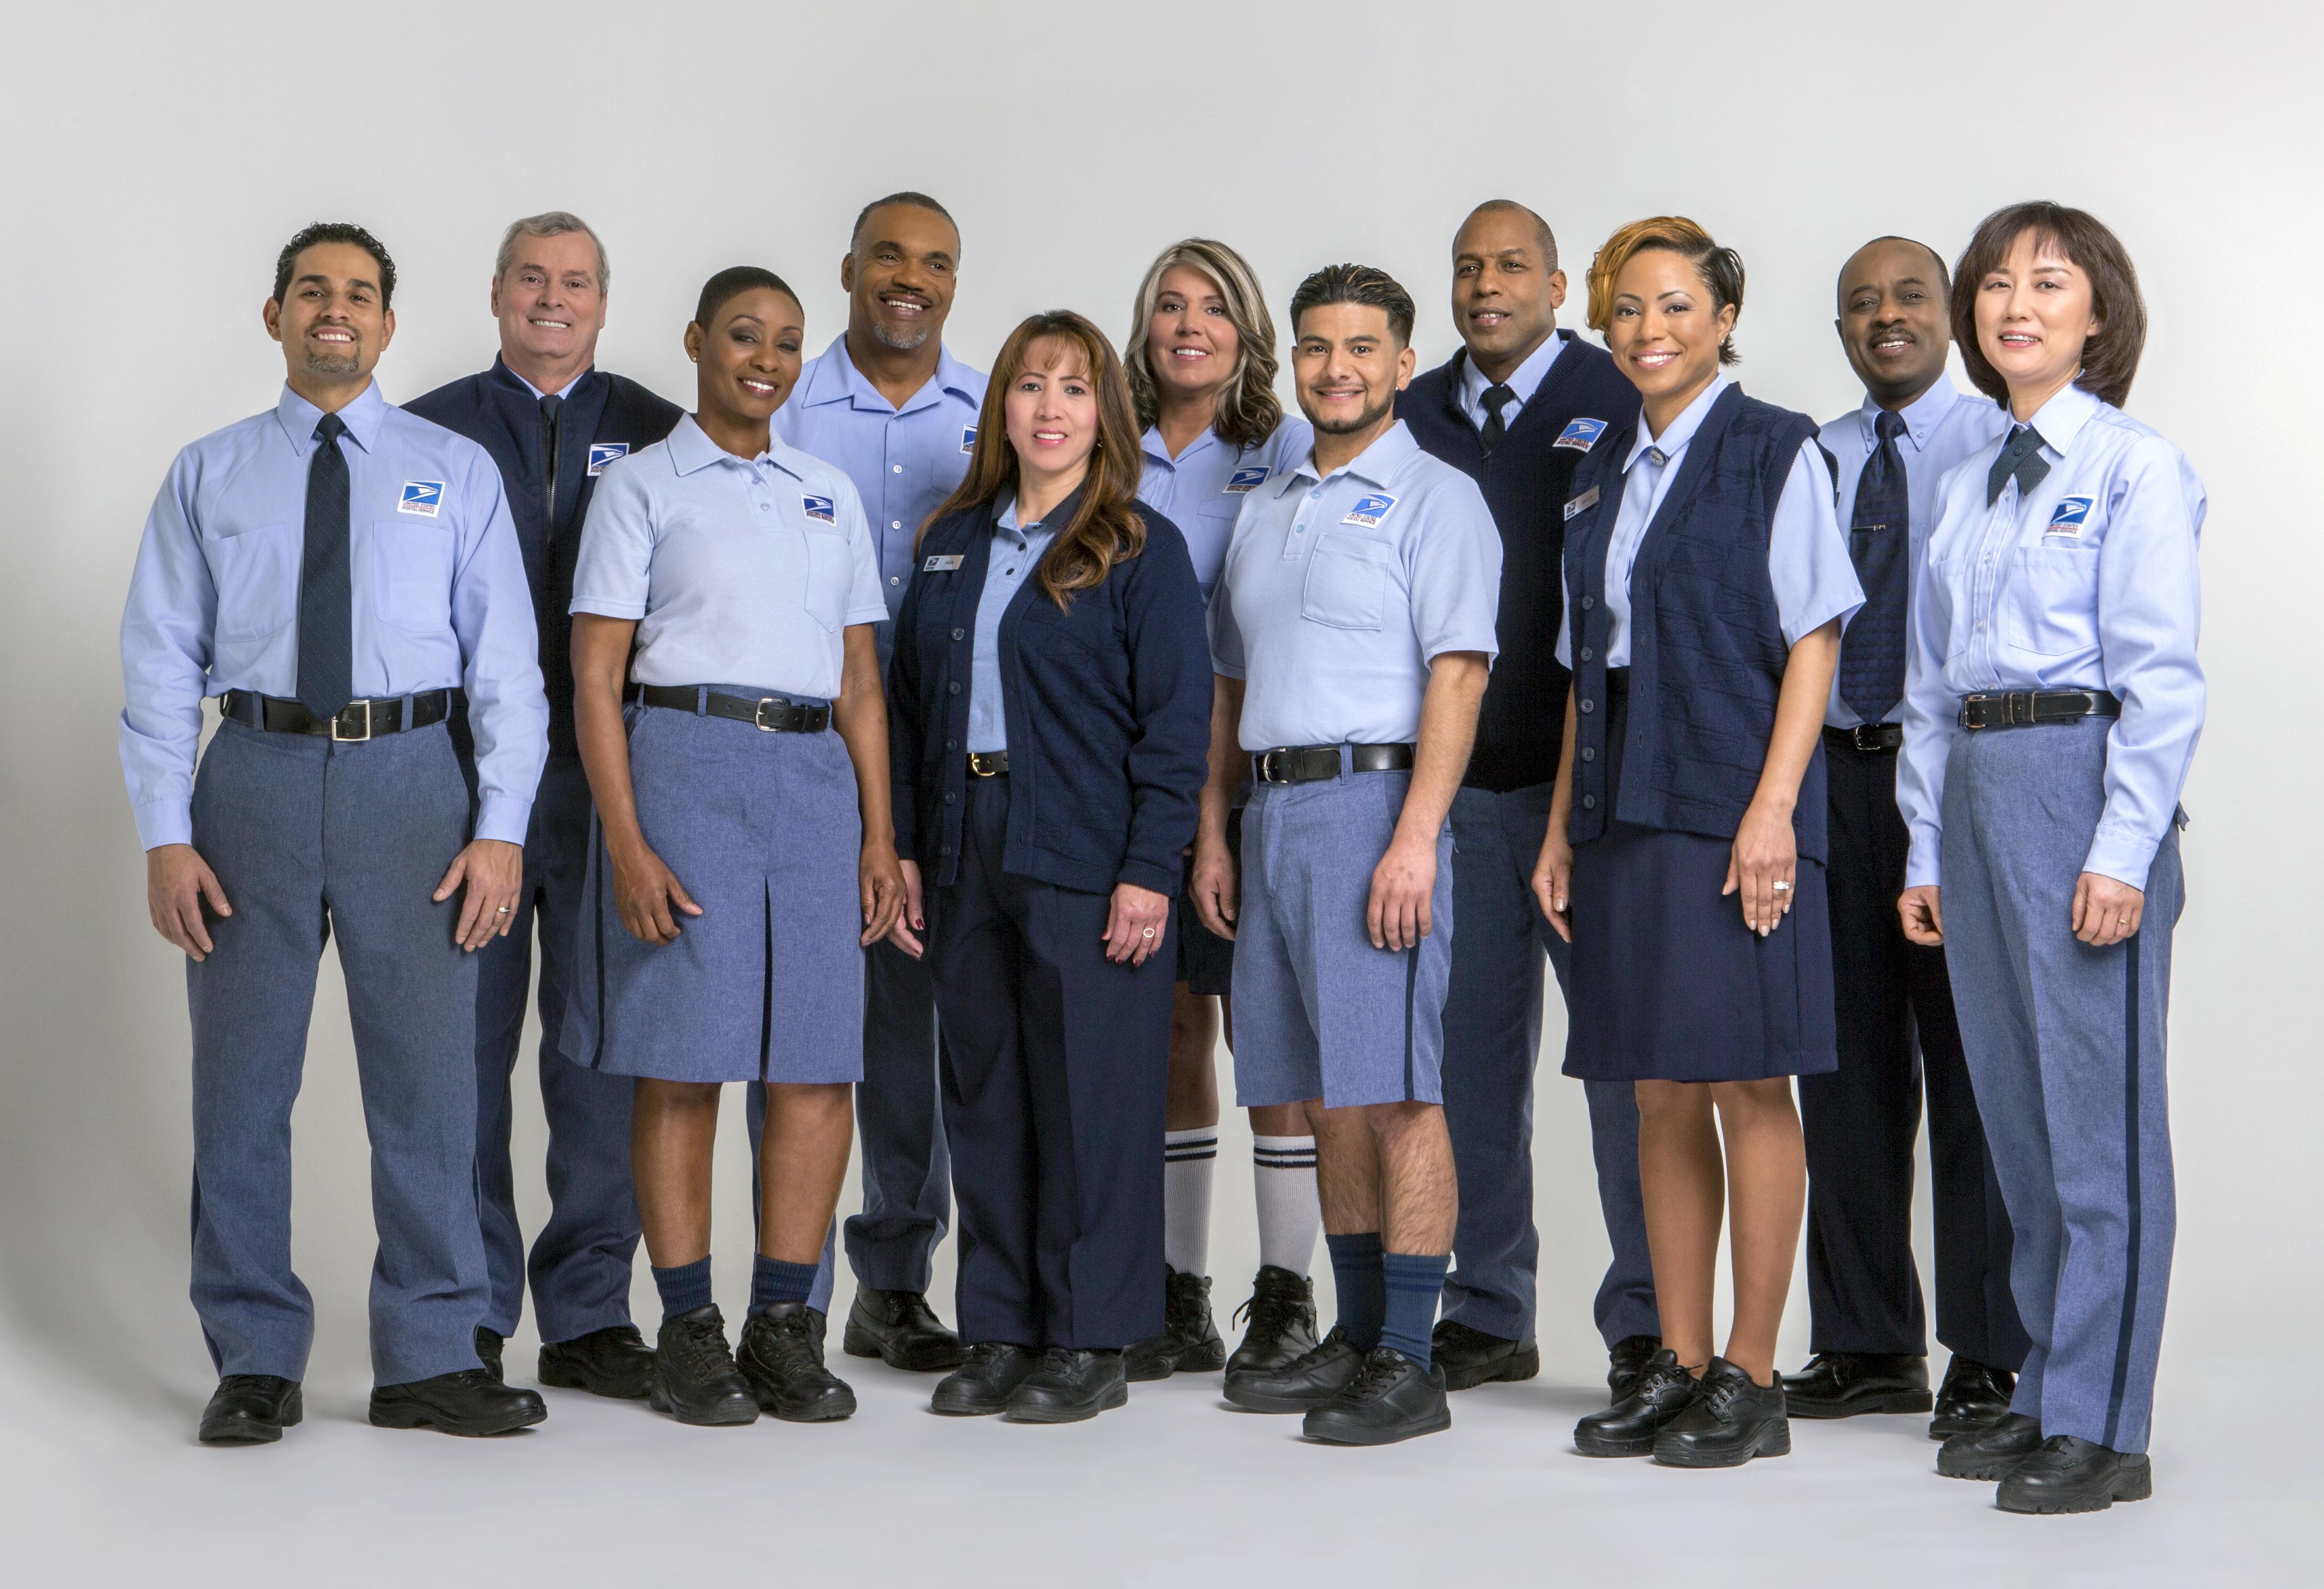 Postal workers 18003 0842 02 07 2018